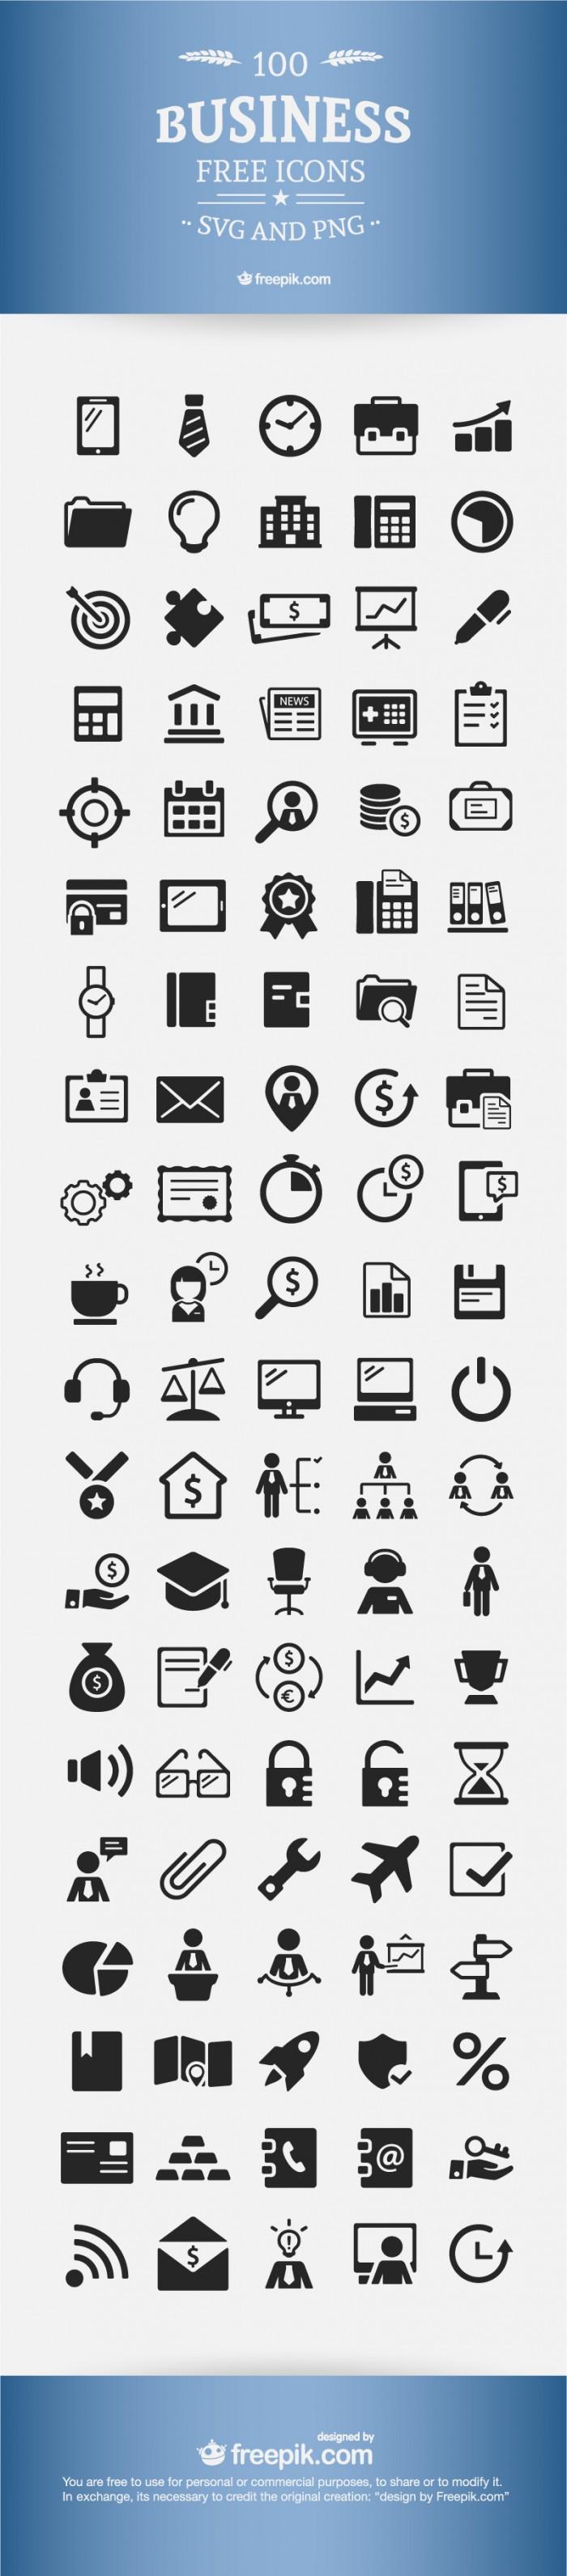 Download Free Business Icons 100 Vectors Ewebdesign Bewerbung Lebenslauf Lebenslauf Kurzbewerbung